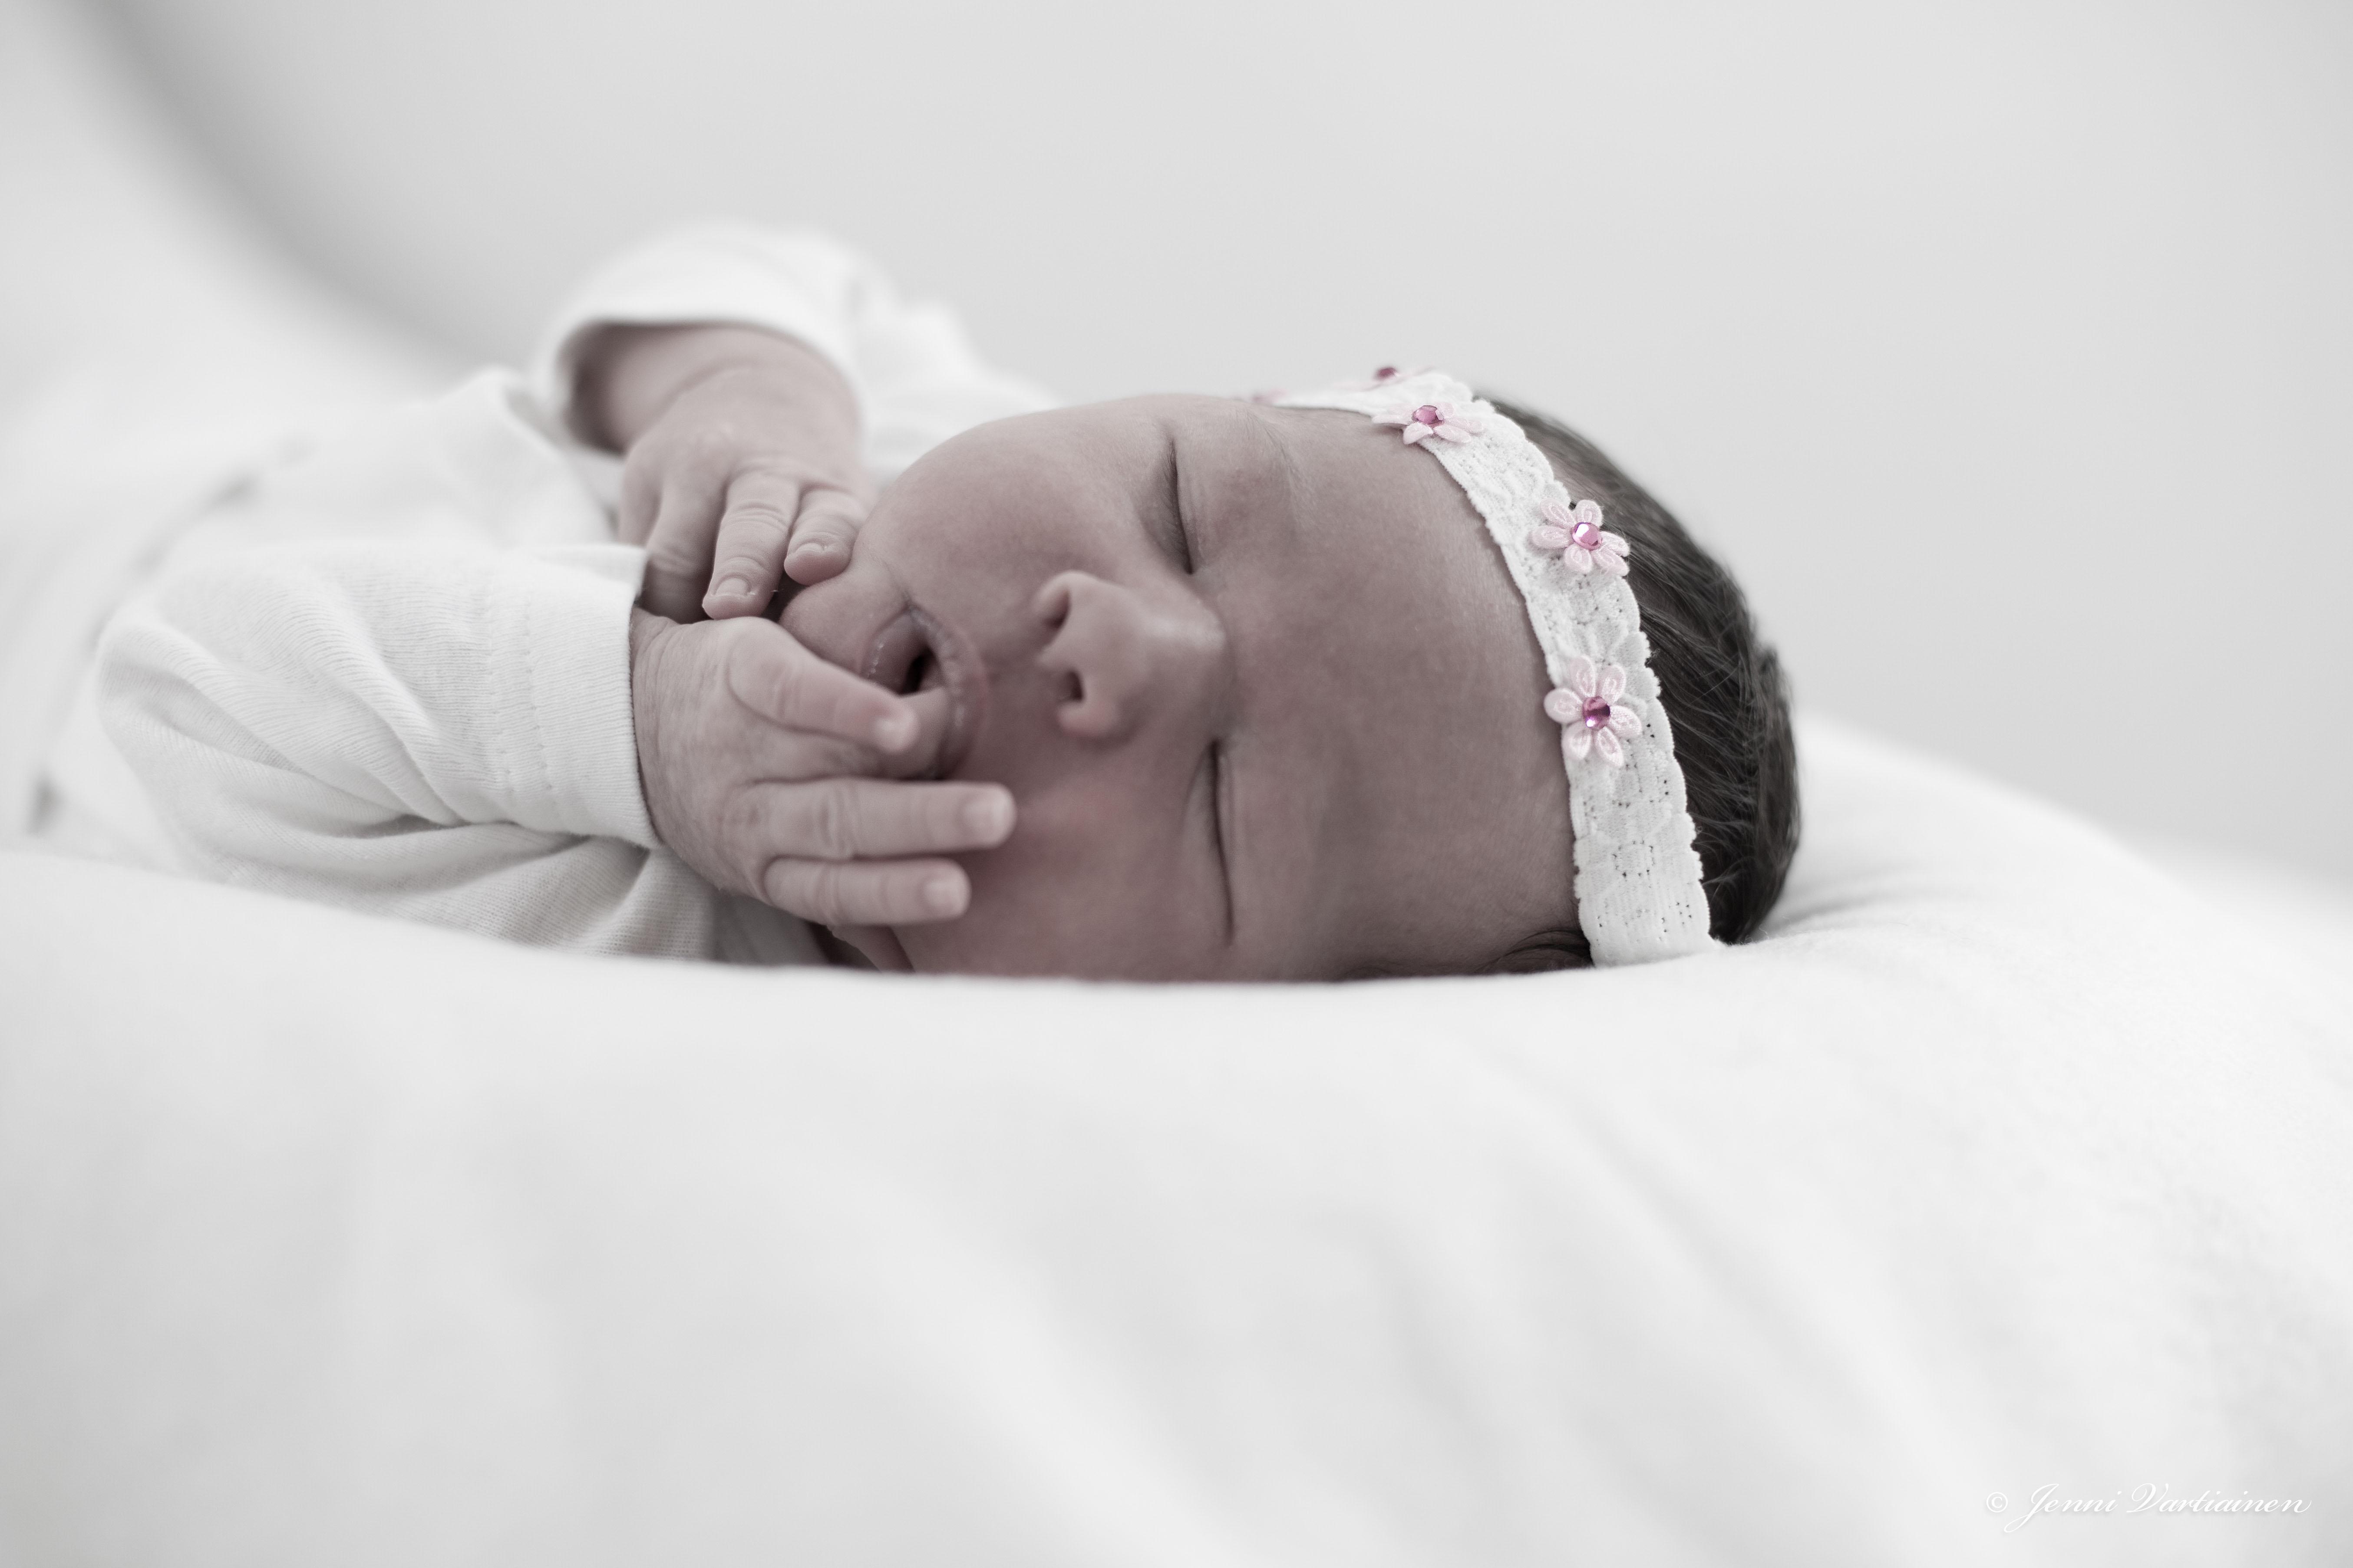 vauvakuvaus (1 of 1)